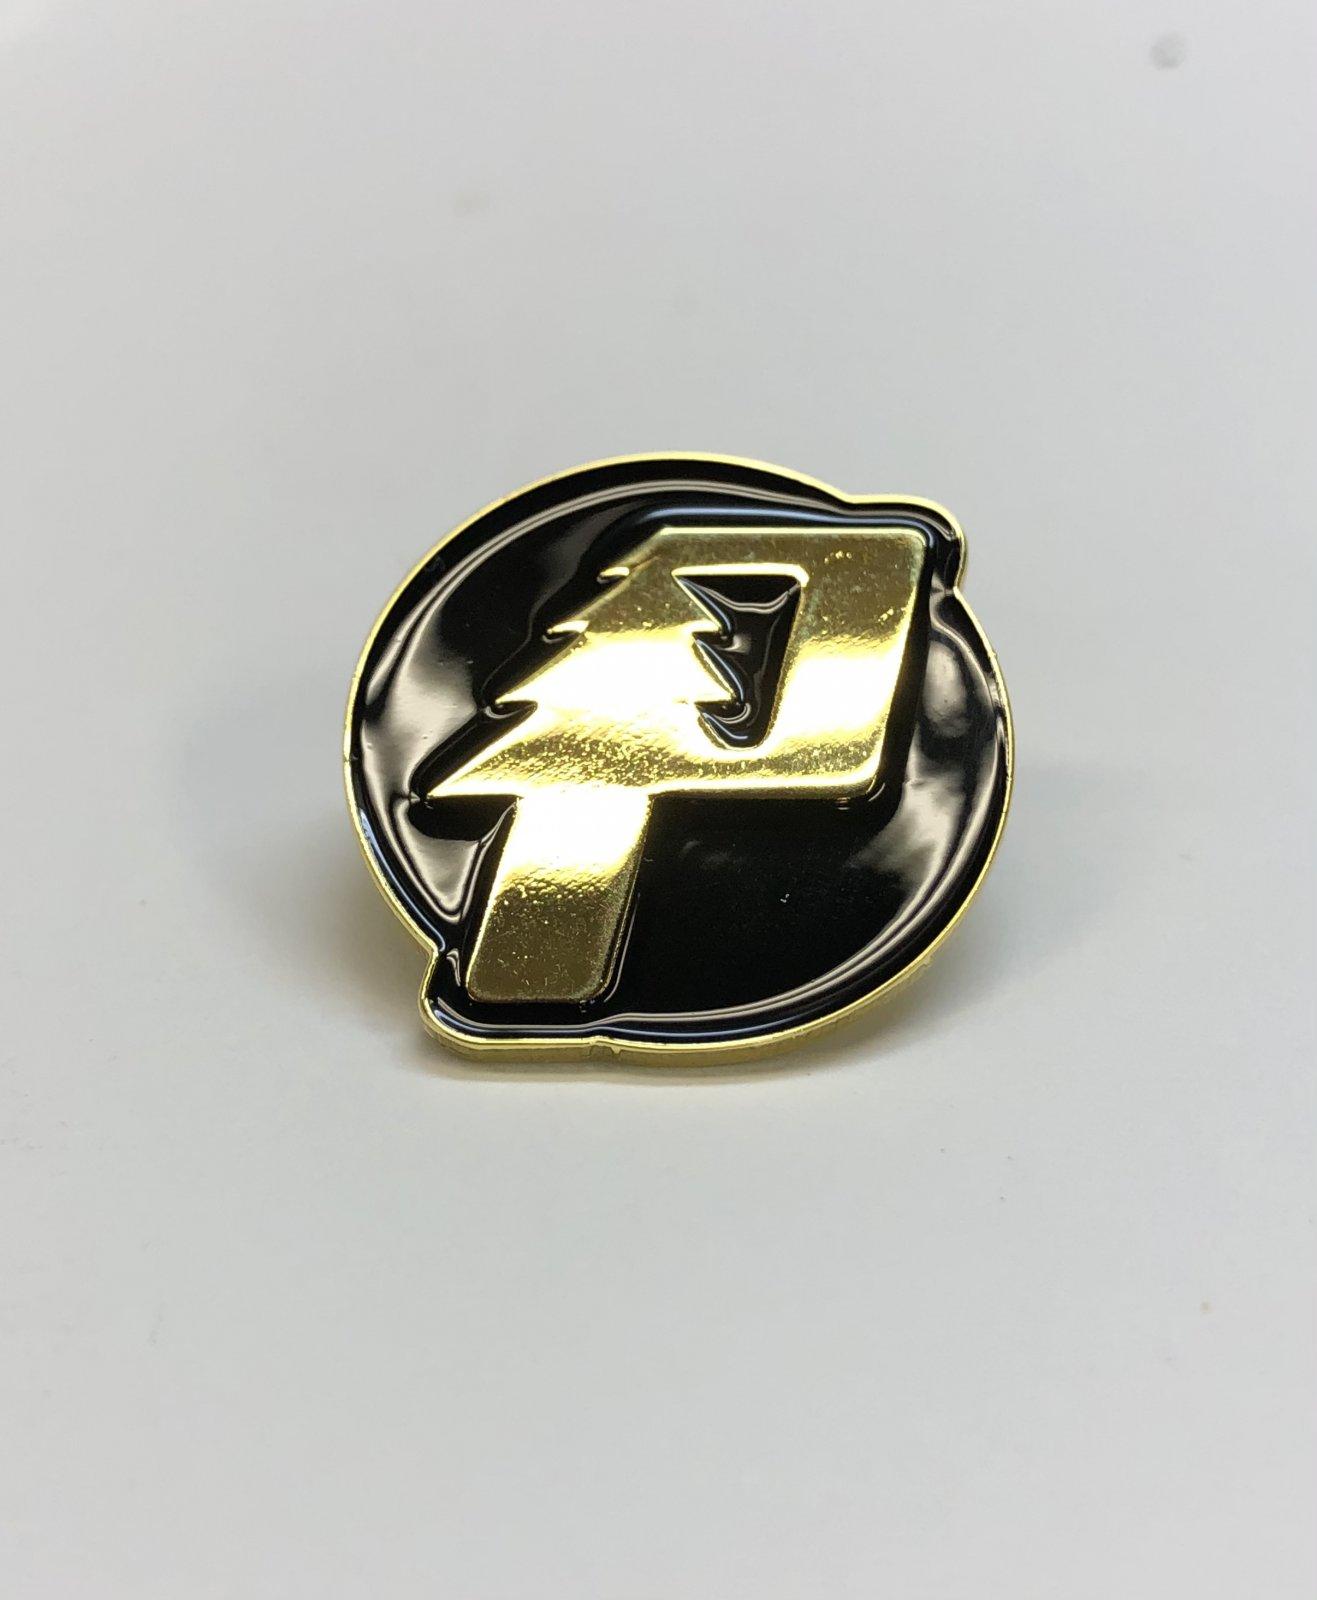 Pinewski's Enamel Pin